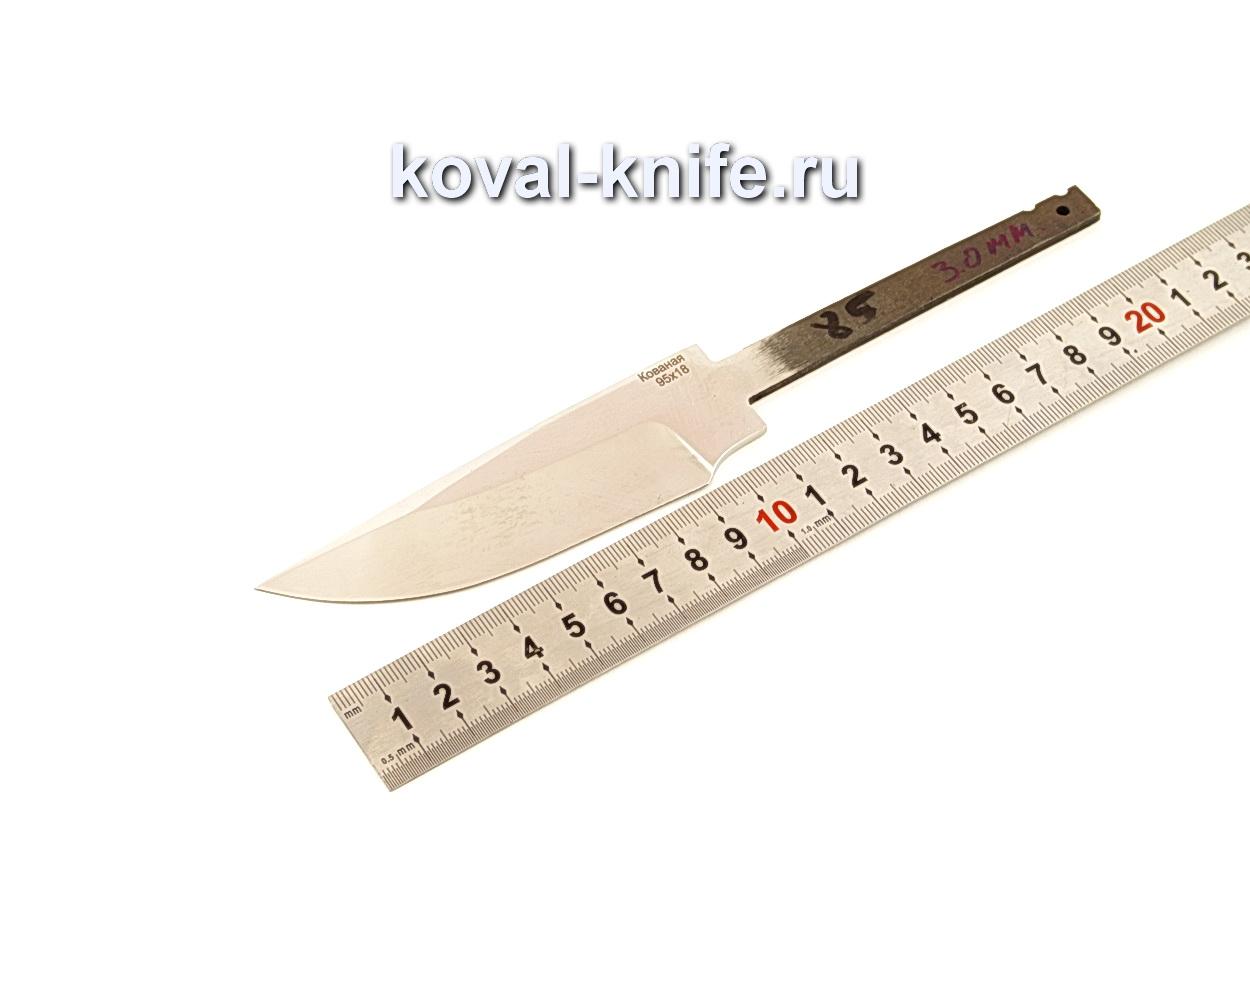 Клинок для ножа из кованой 95Х18 N85